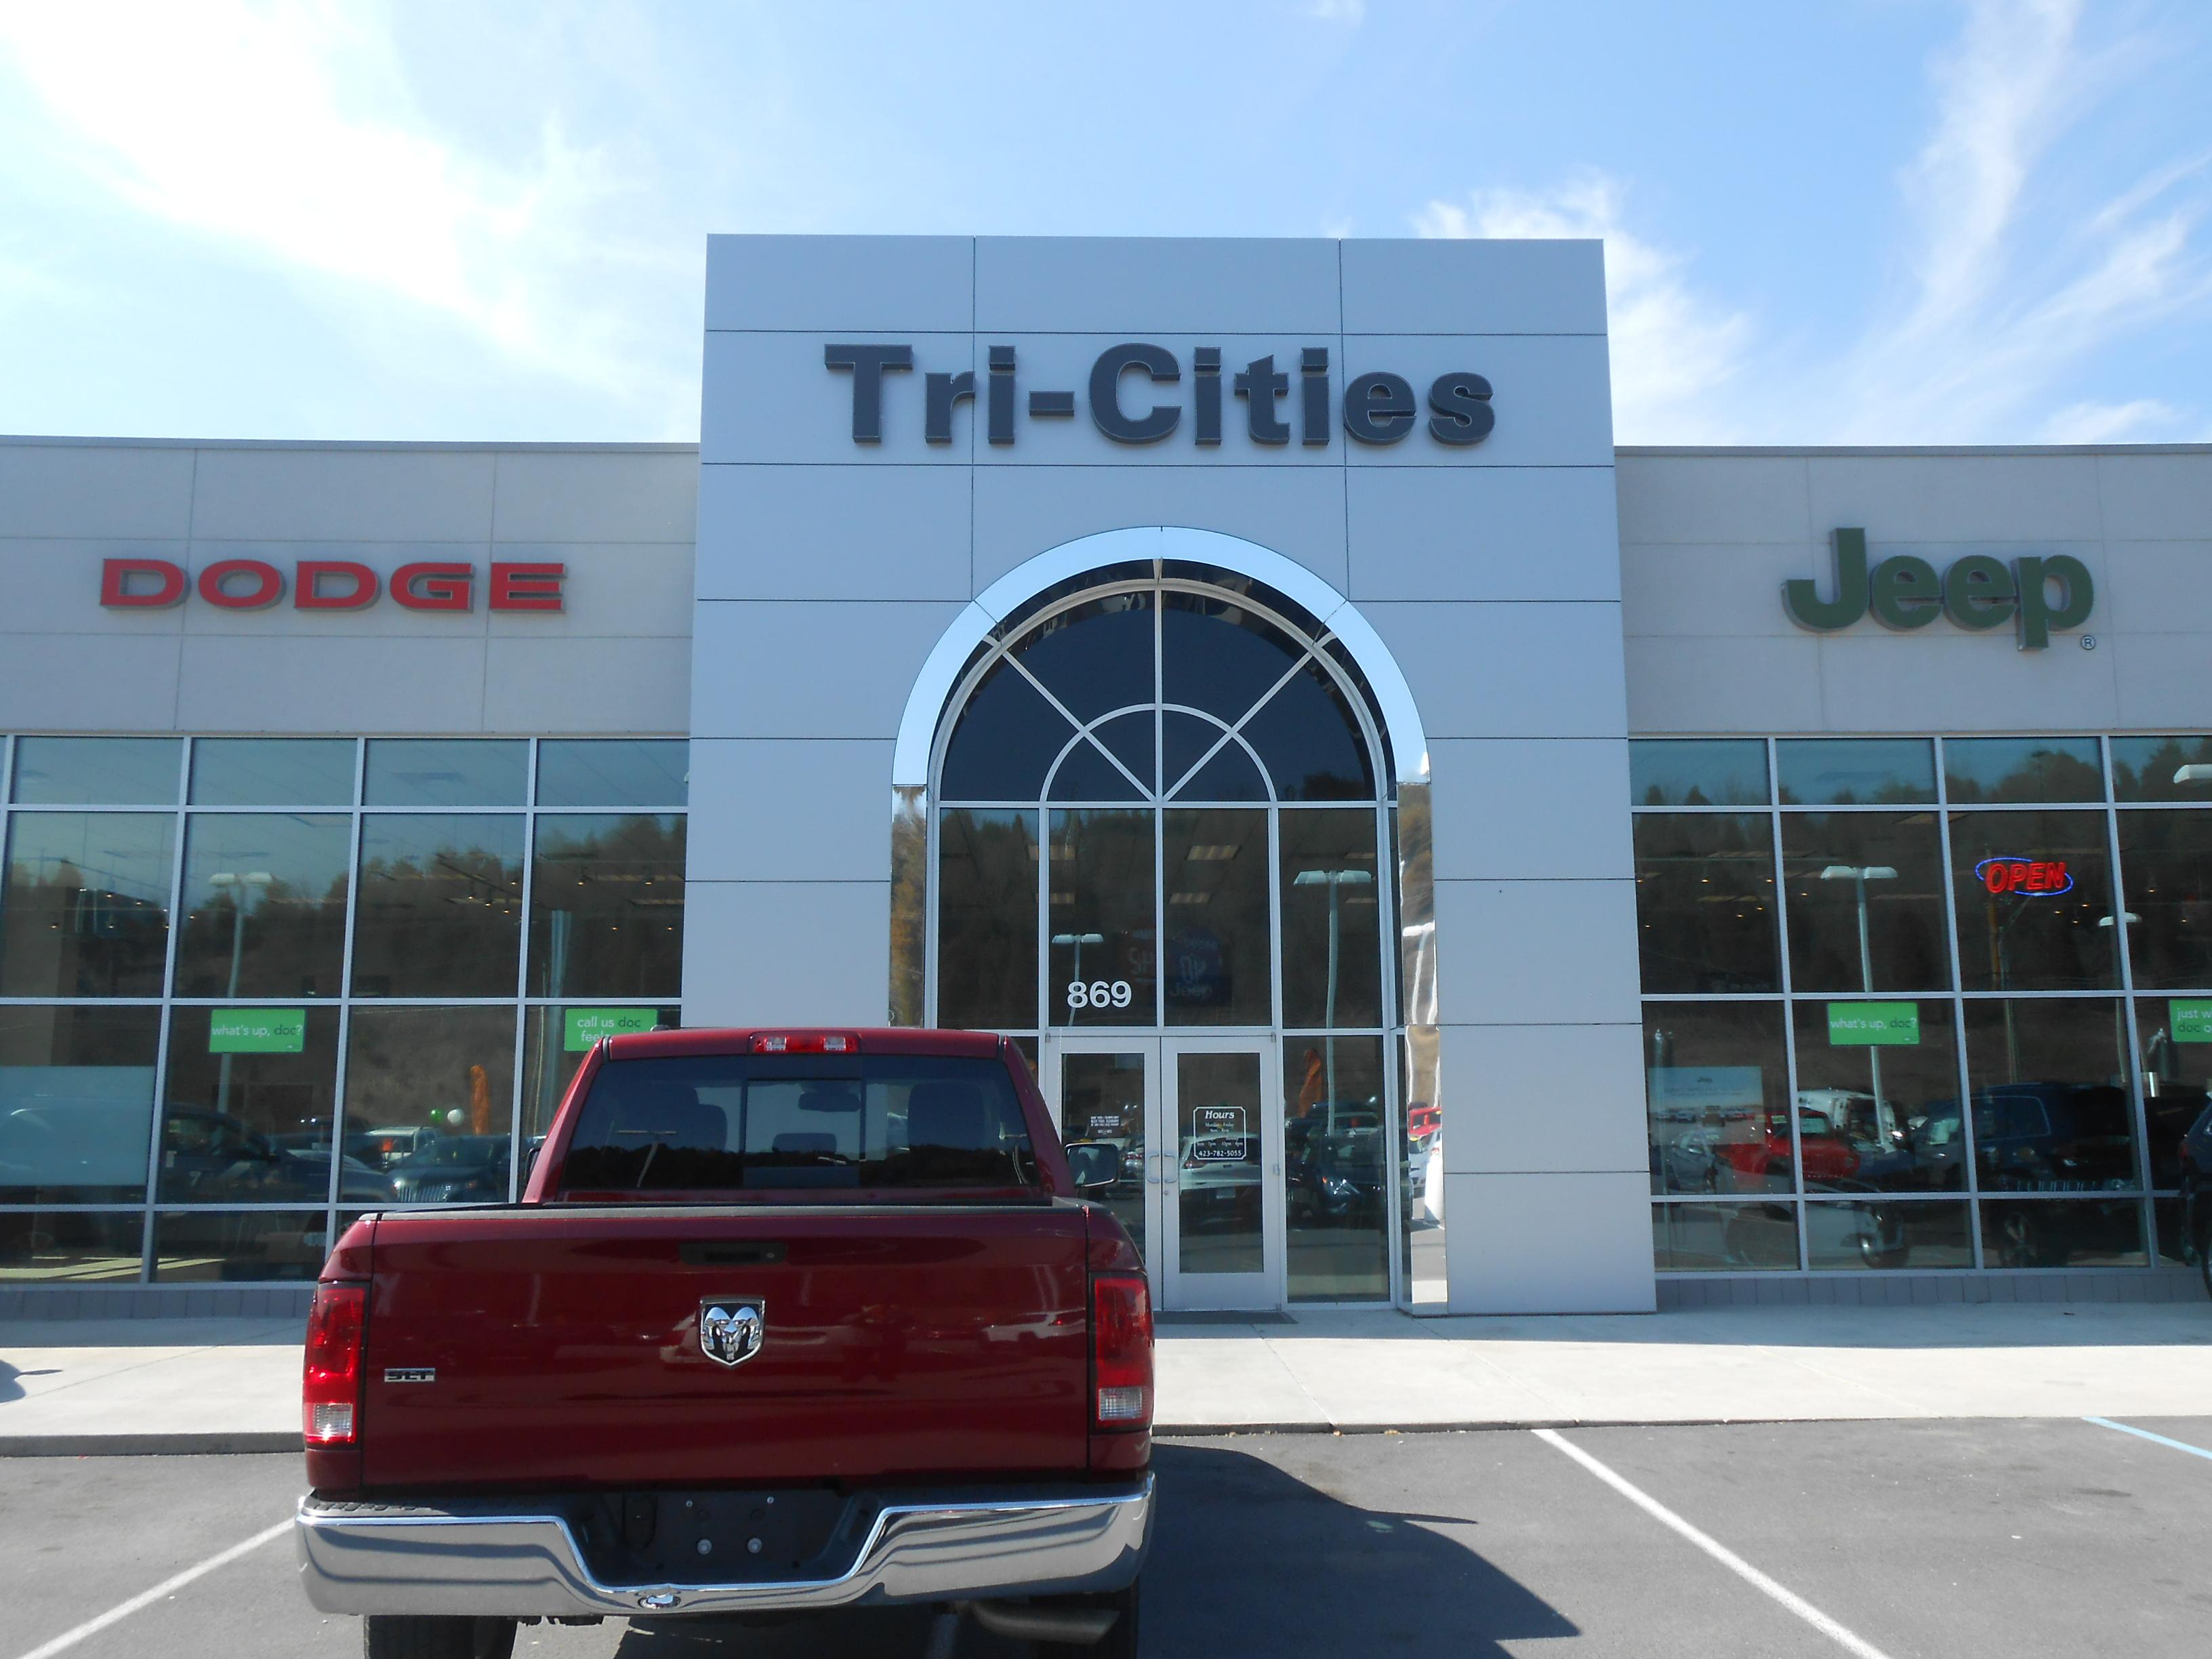 Tri Cities Dodge >> Tri-Cities Chrysler Dodge Jeep Ram, Kingsport Tennessee (TN) - LocalDatabase.com